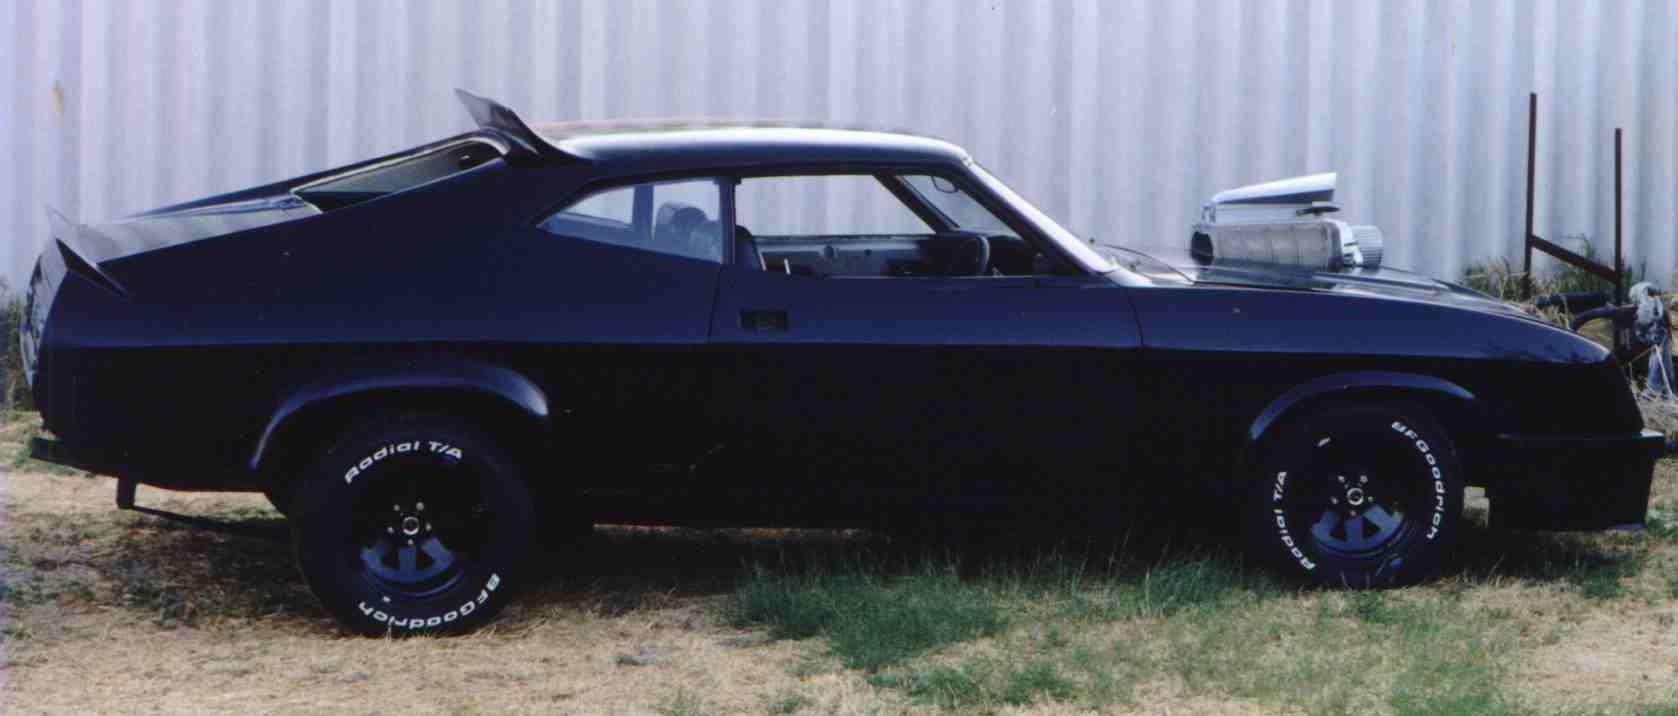 Mad Max Fan Cars Gordon Hayes Black Interceptor 2